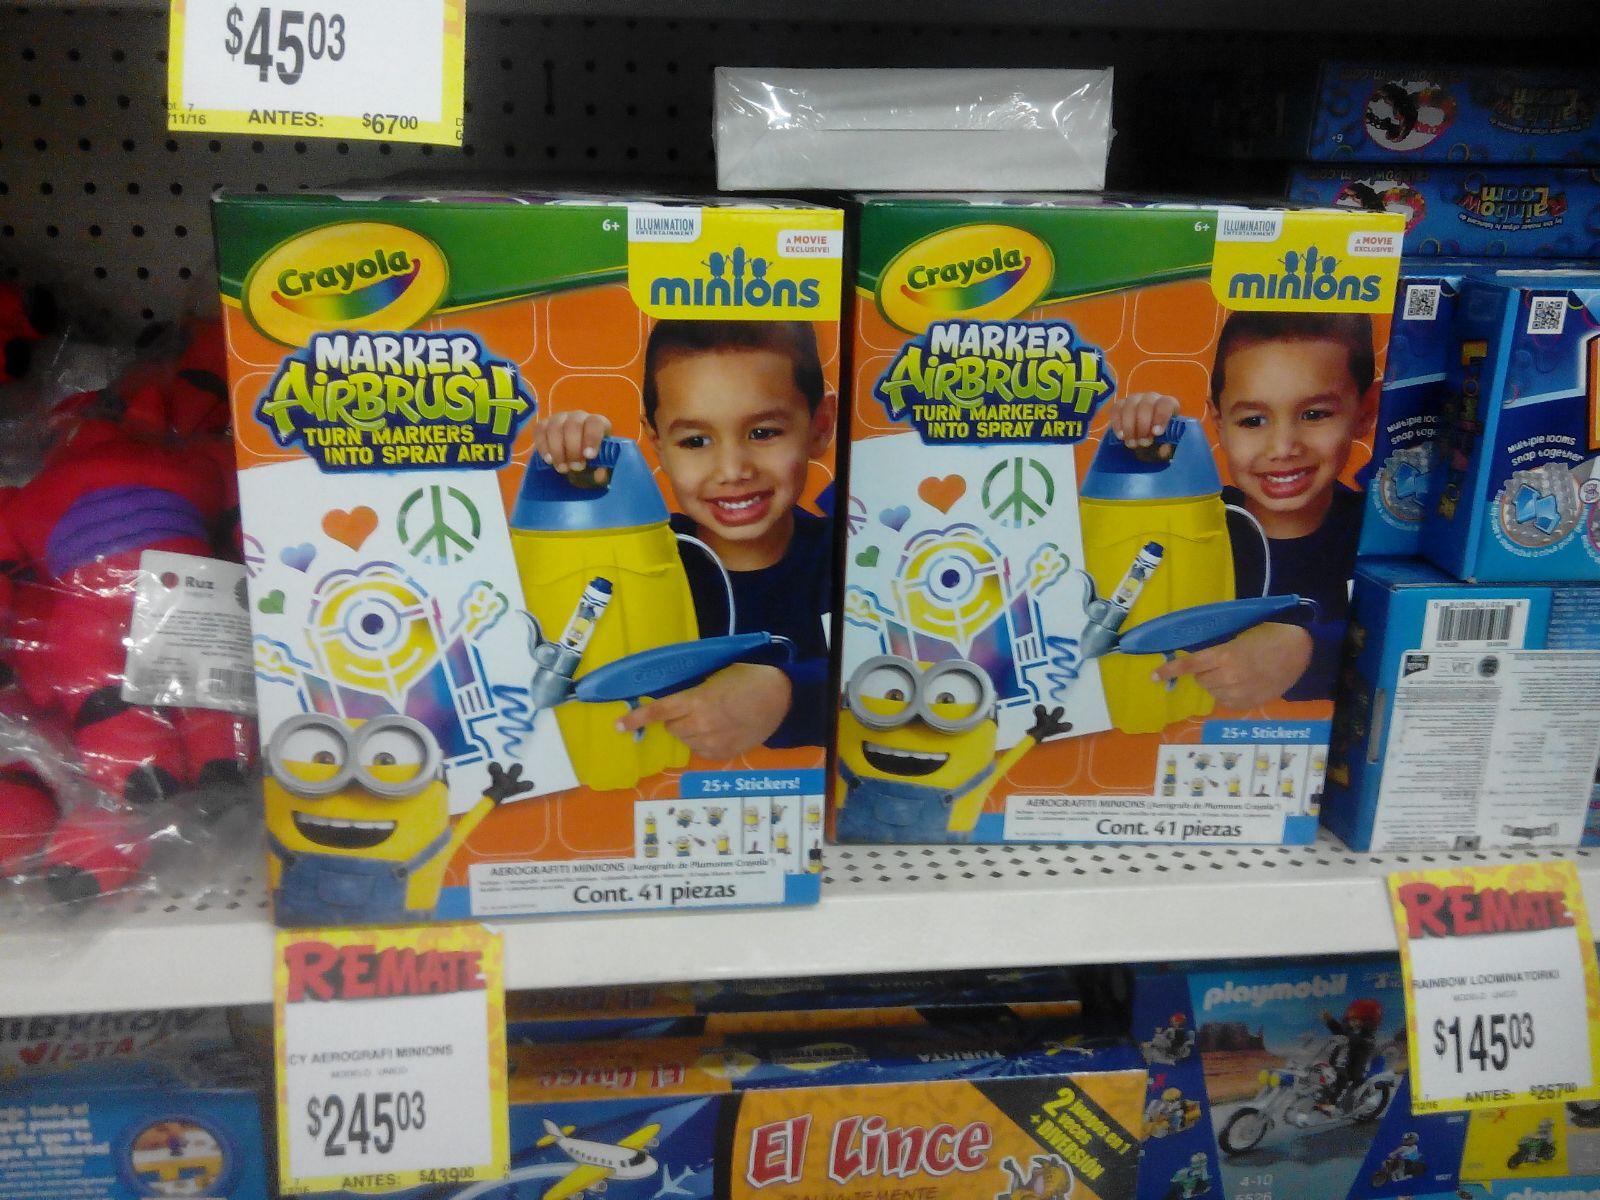 Bodega Aurrerá: Crayola Minions Marker Airbrush a $245.03